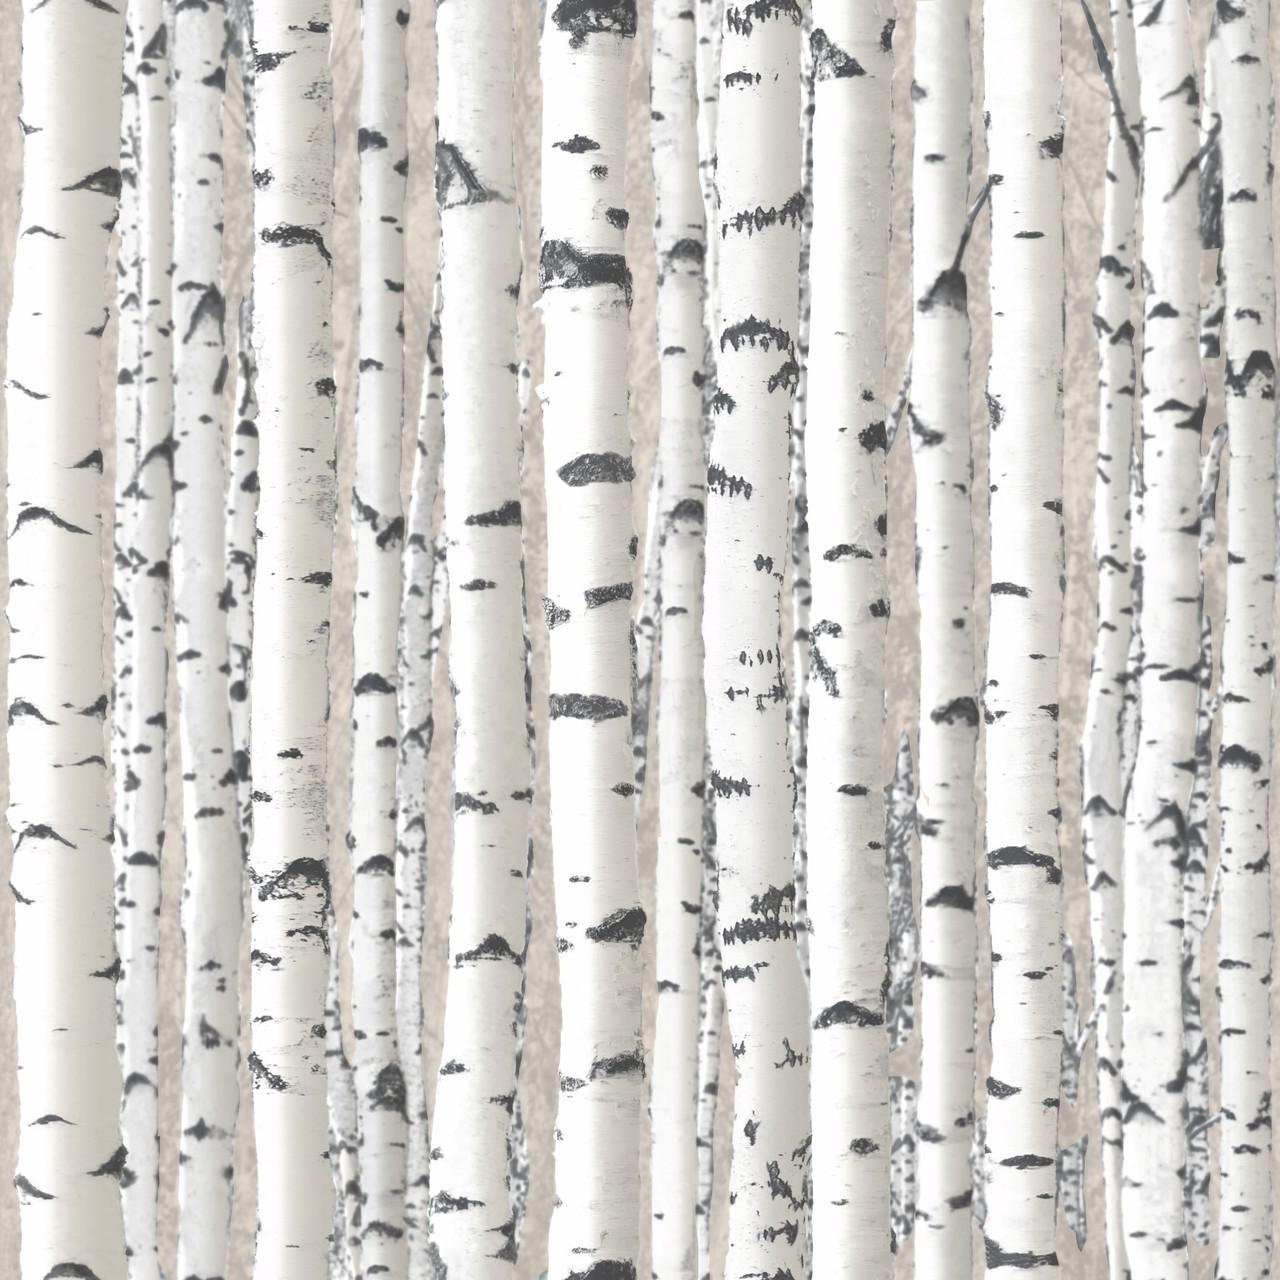 Birch Tree Wallpaper (11 Wallpapers) - Adorable Wallpapers